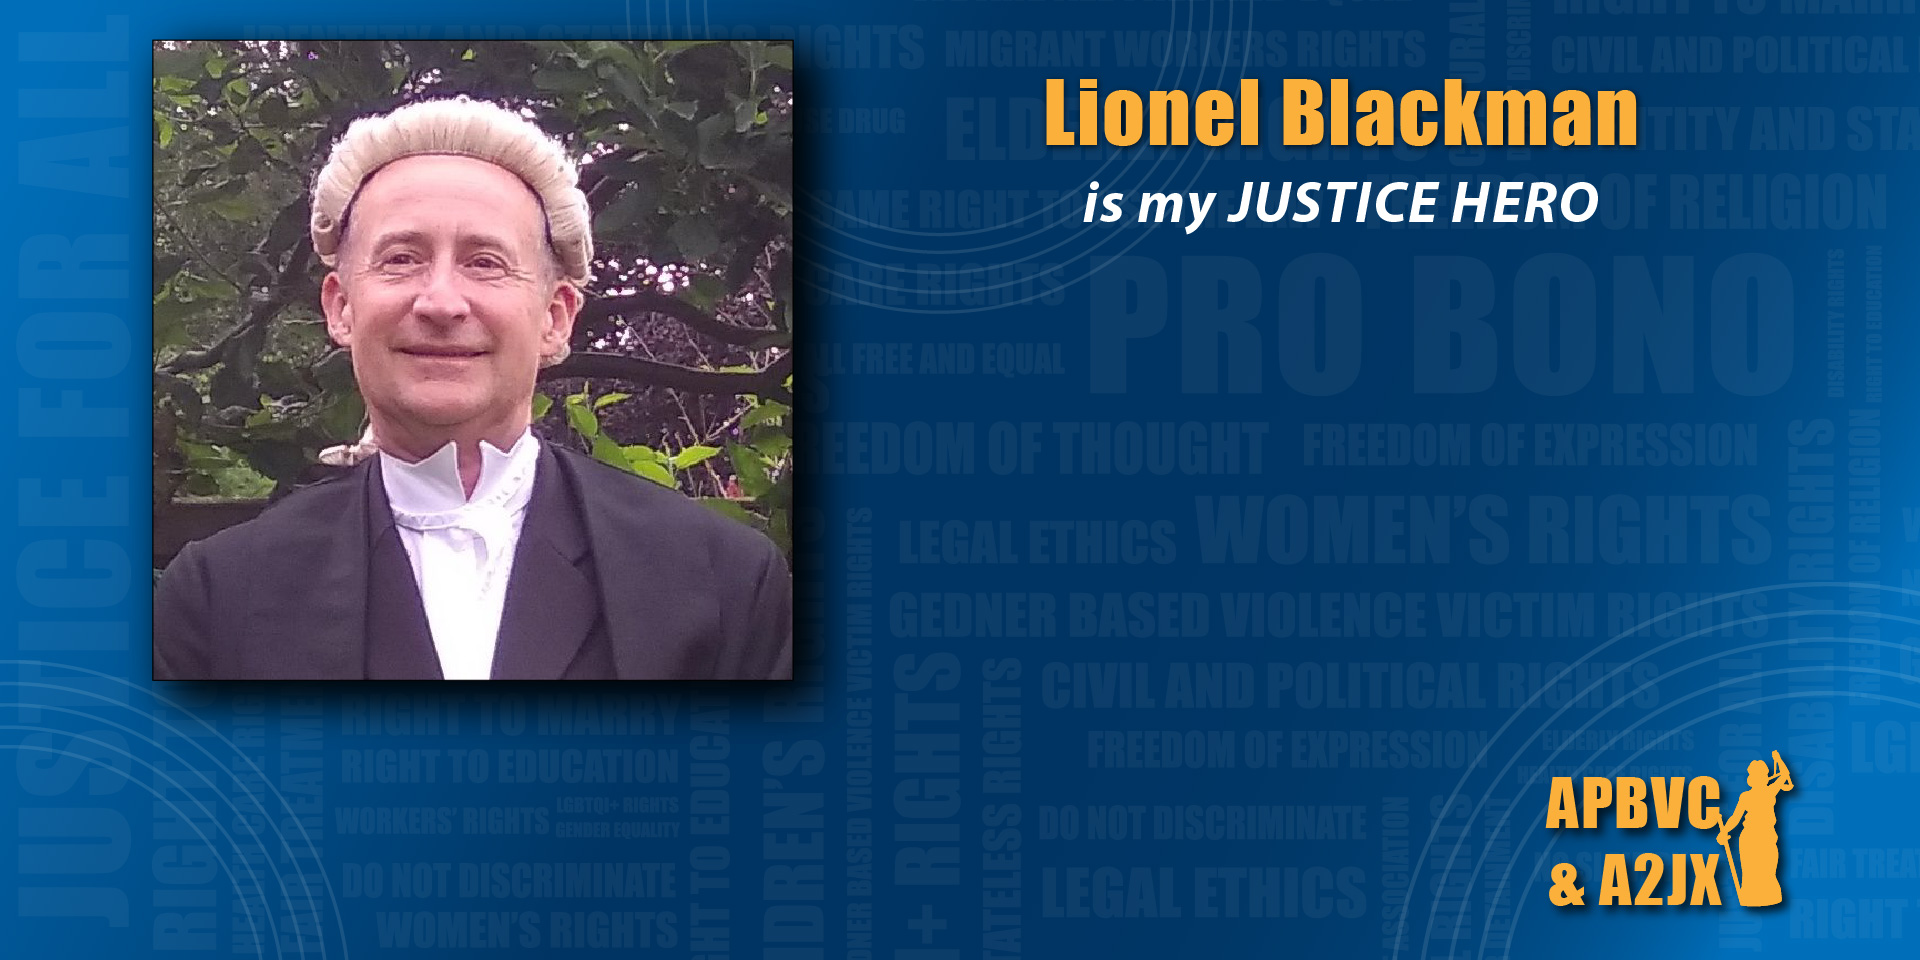 Lionel Blackman